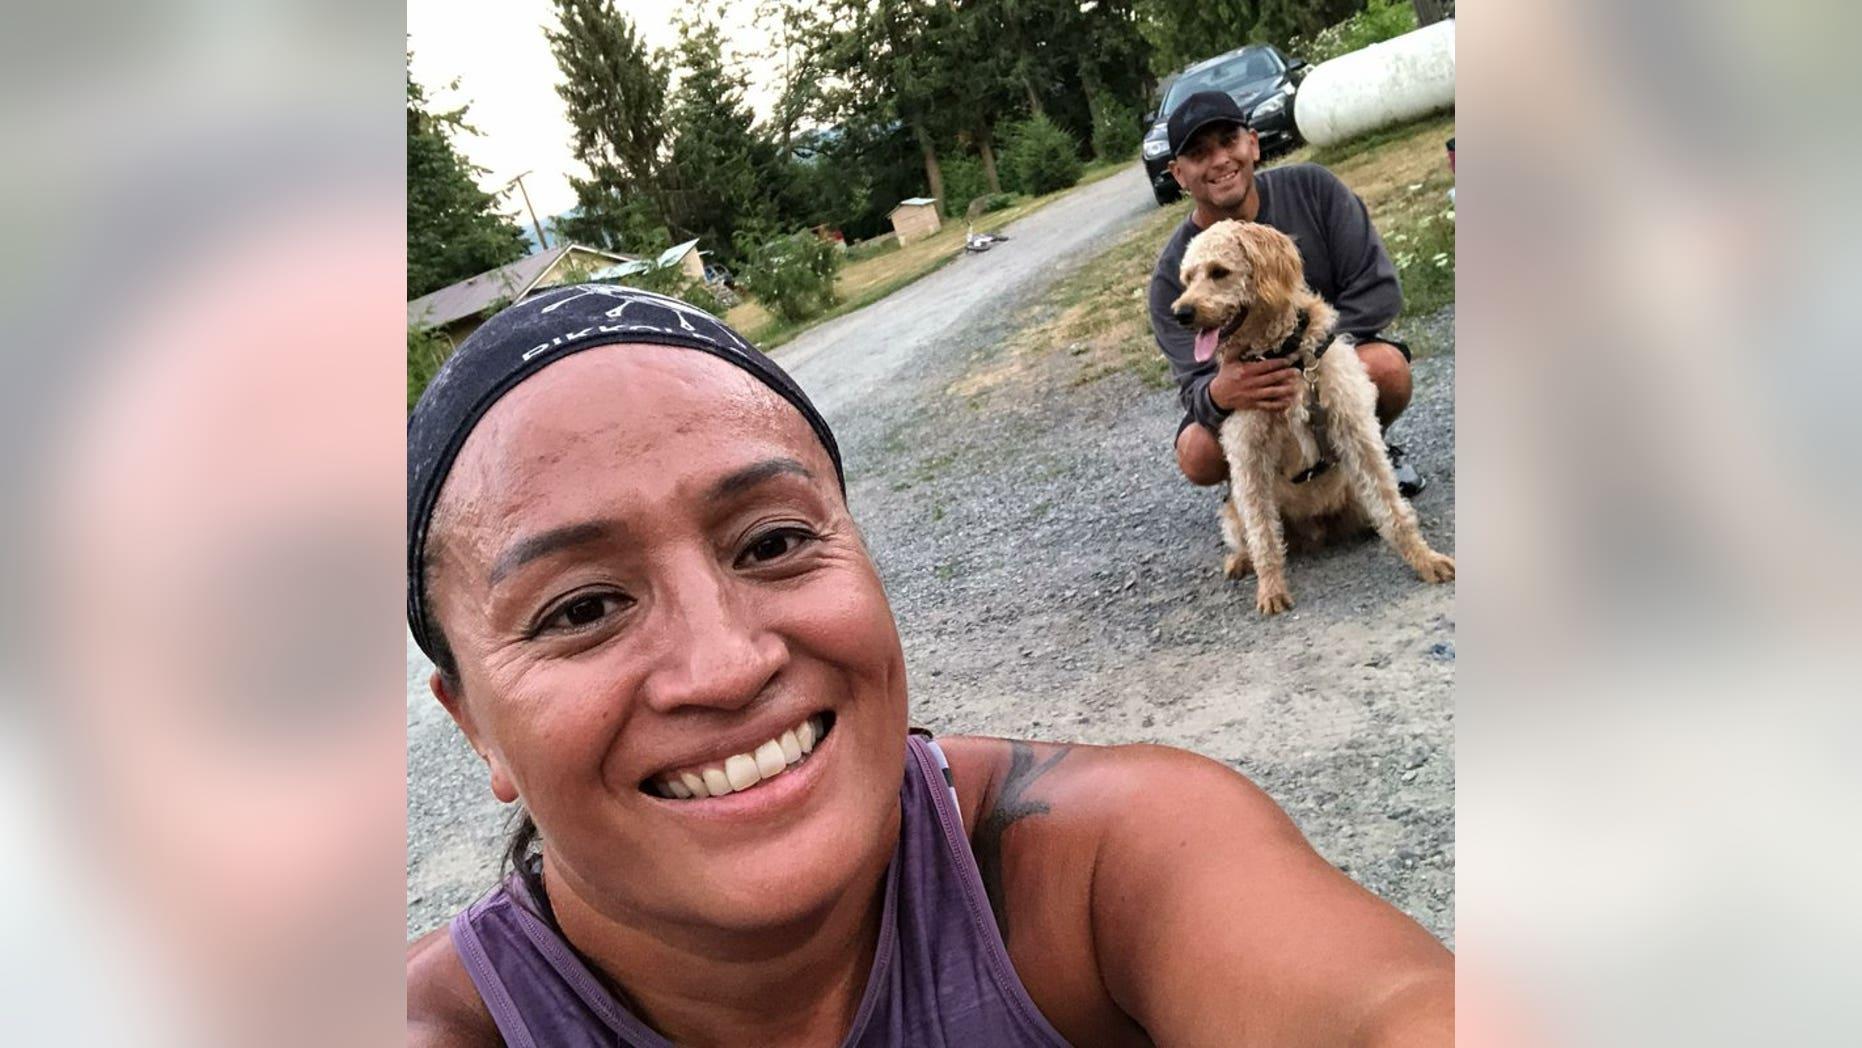 Lona and Joseph Johnson, two survivors from the Las Vegas shooting, say their neighbor killed their comfort dog, Jax.